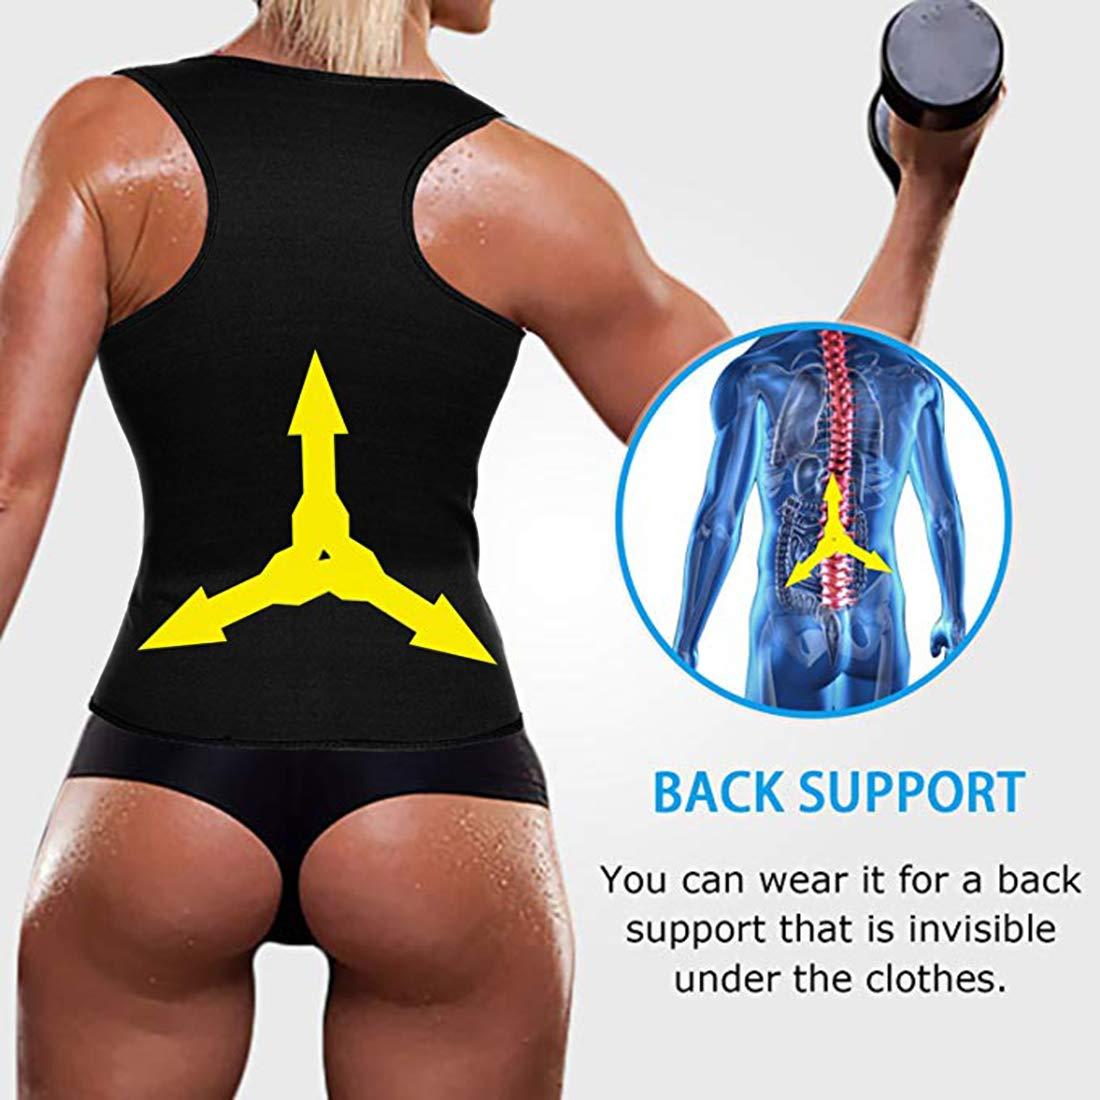 Litthing Sauna para Mujer Chaleco de Entrenamiento Chaleco de cors/é Cintura de Entrenamiento Cors/é Camisa para Adelgazar Gimnasio Cinturones para Bajar de Peso